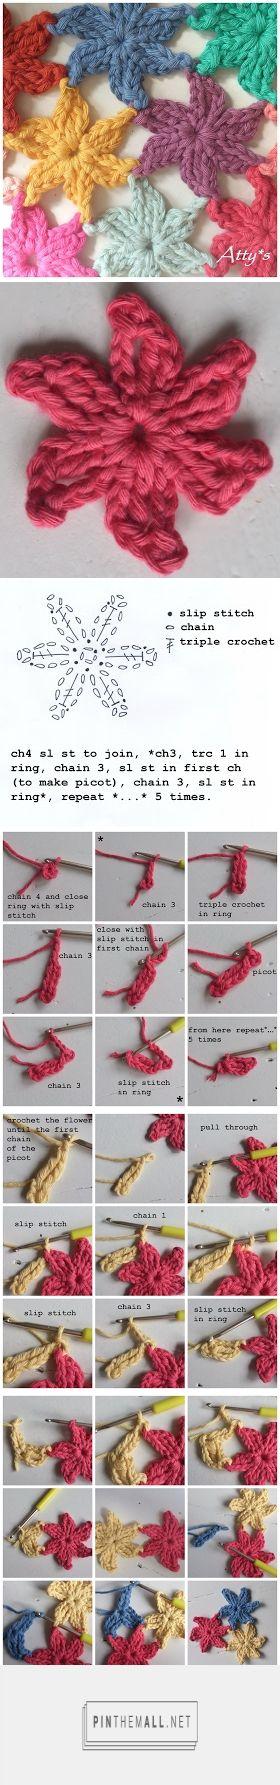 #Crochet_Tutorial - Join as you go flowers. Great idea! Enjoy from #KnittingGuru ** http://www.pinterest.com/KnittingGuru